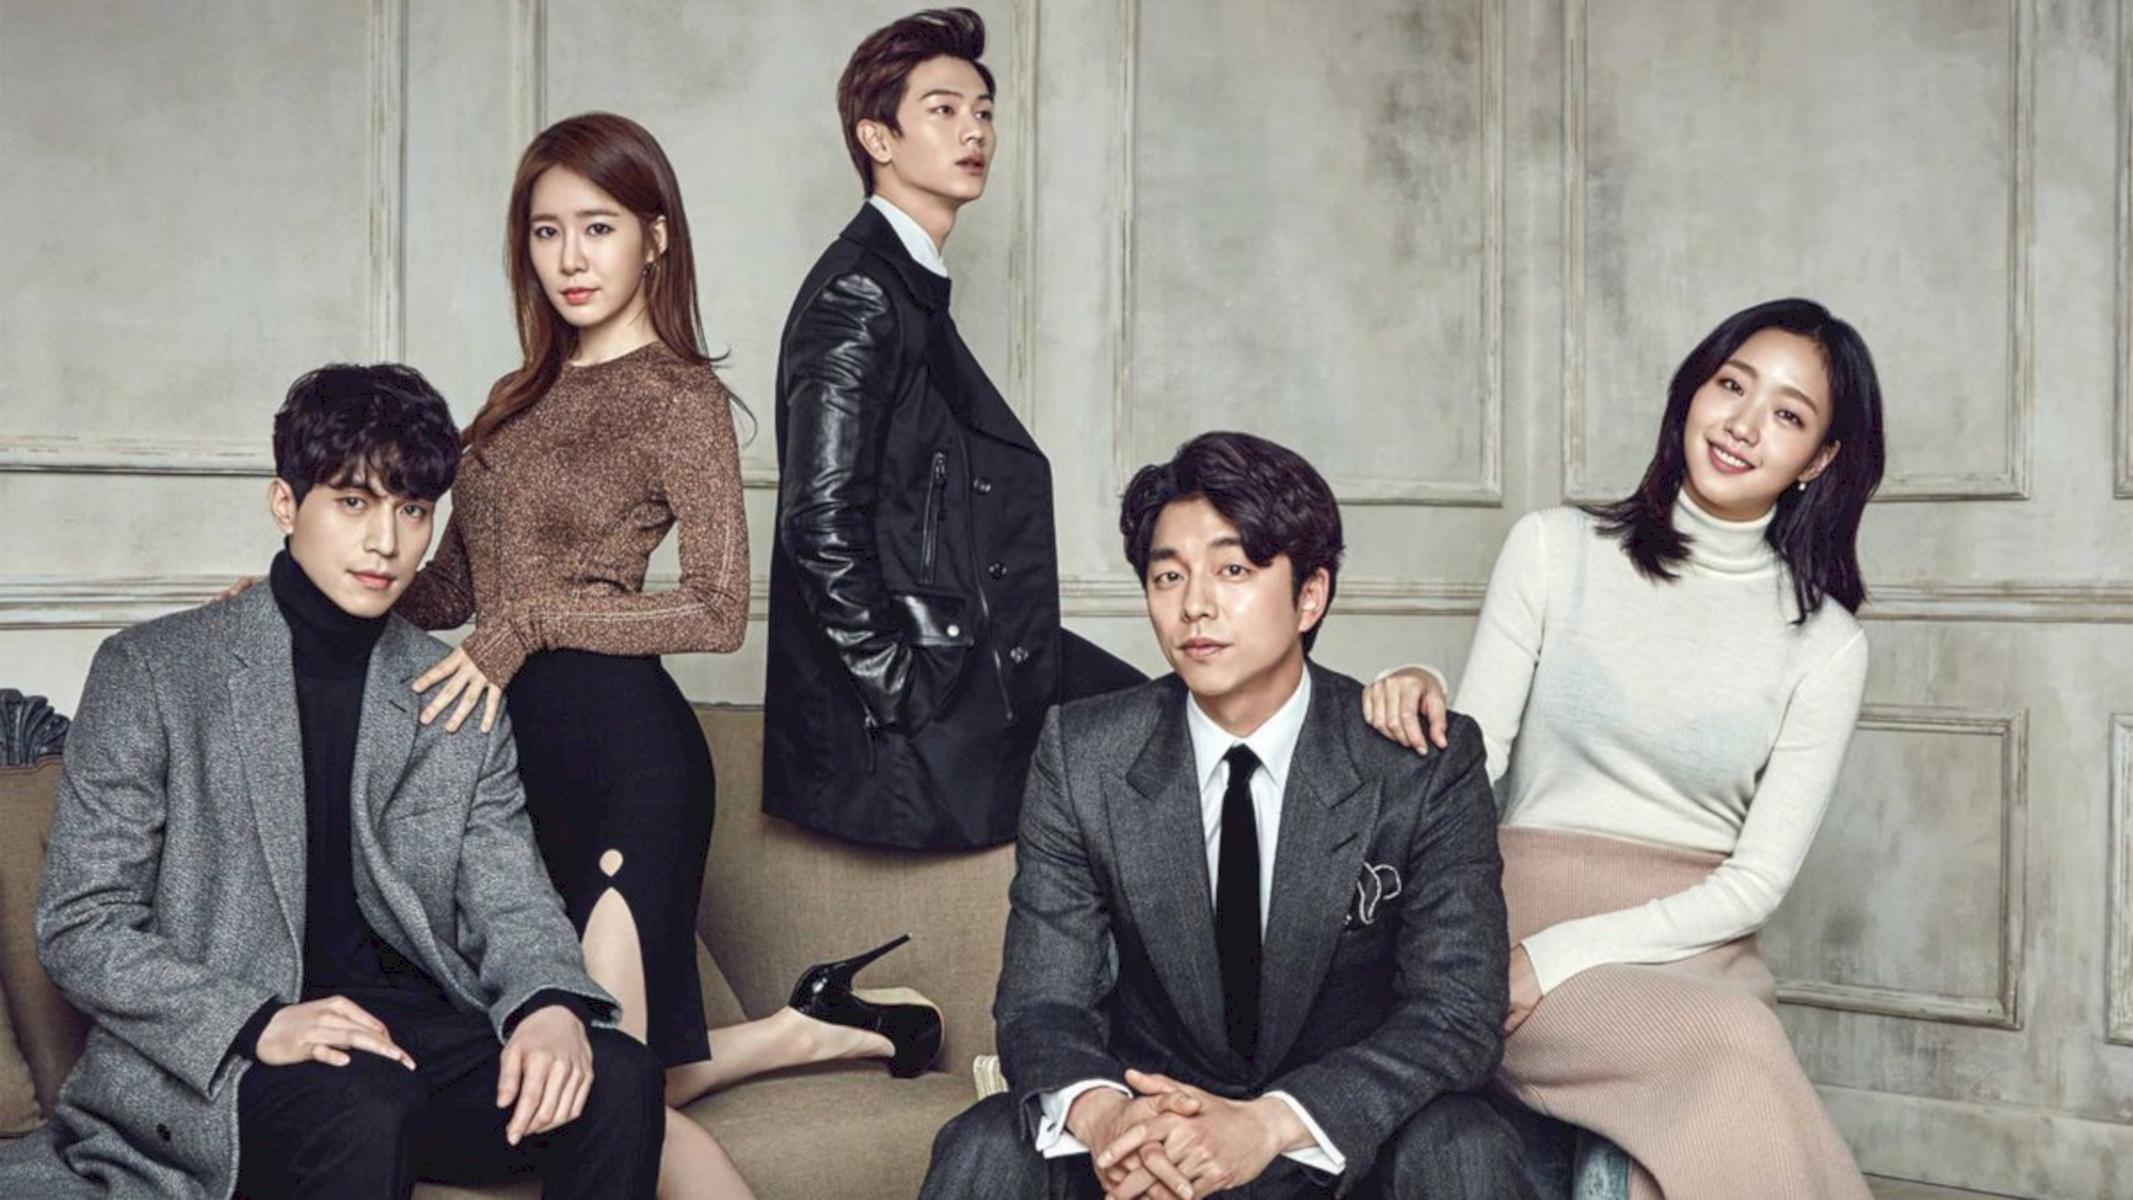 Goblin A Korean Drama Shown On Tv - Goblin Korean Drama Netflix - HD Wallpaper